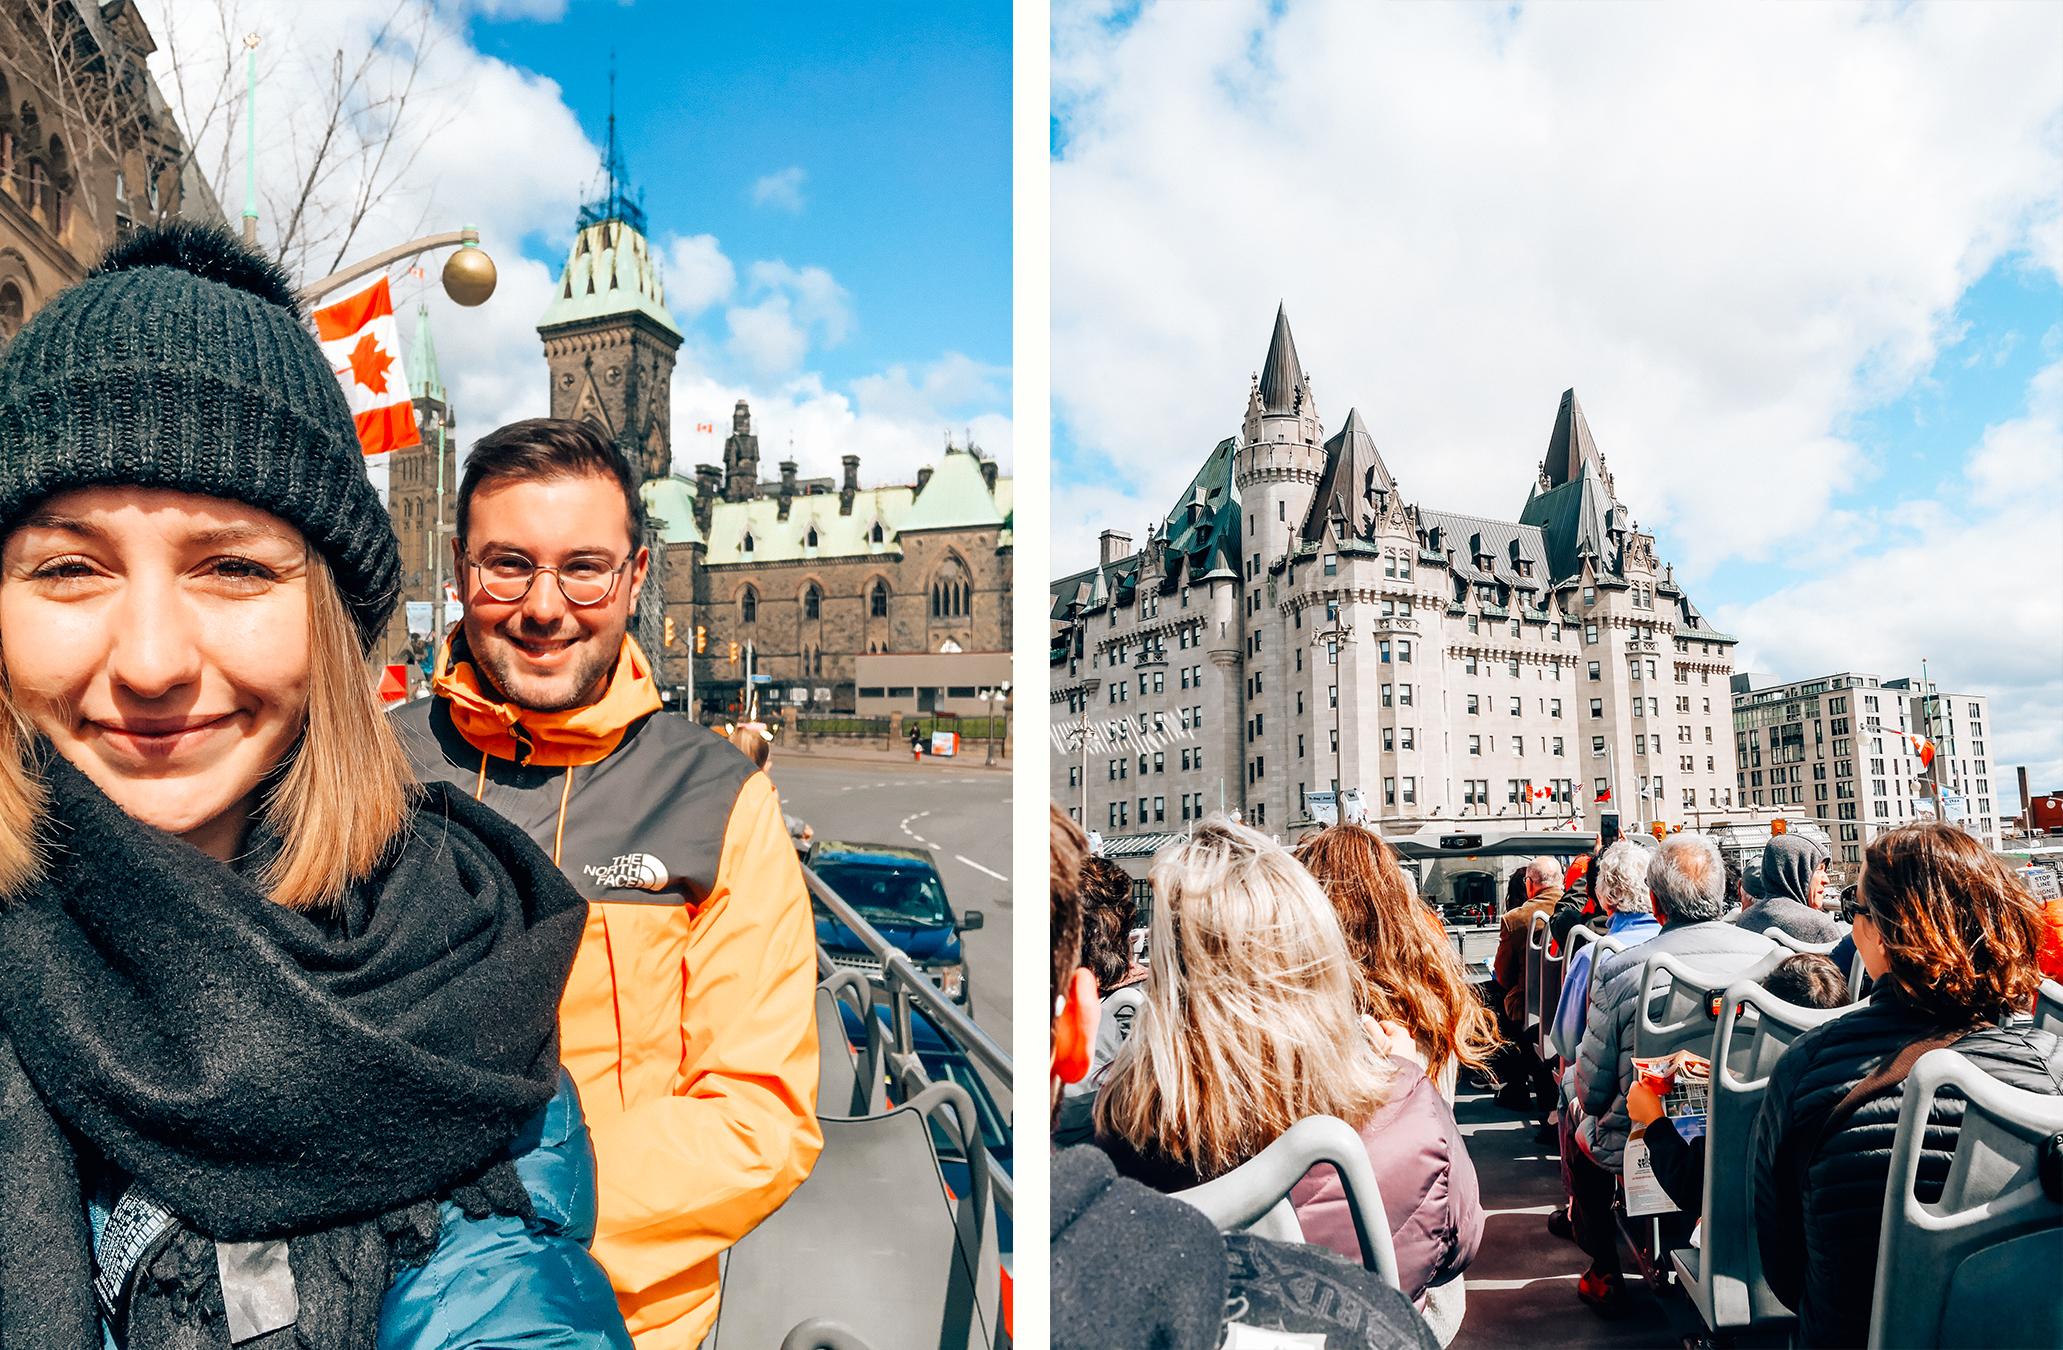 Vister Ottawa en bus